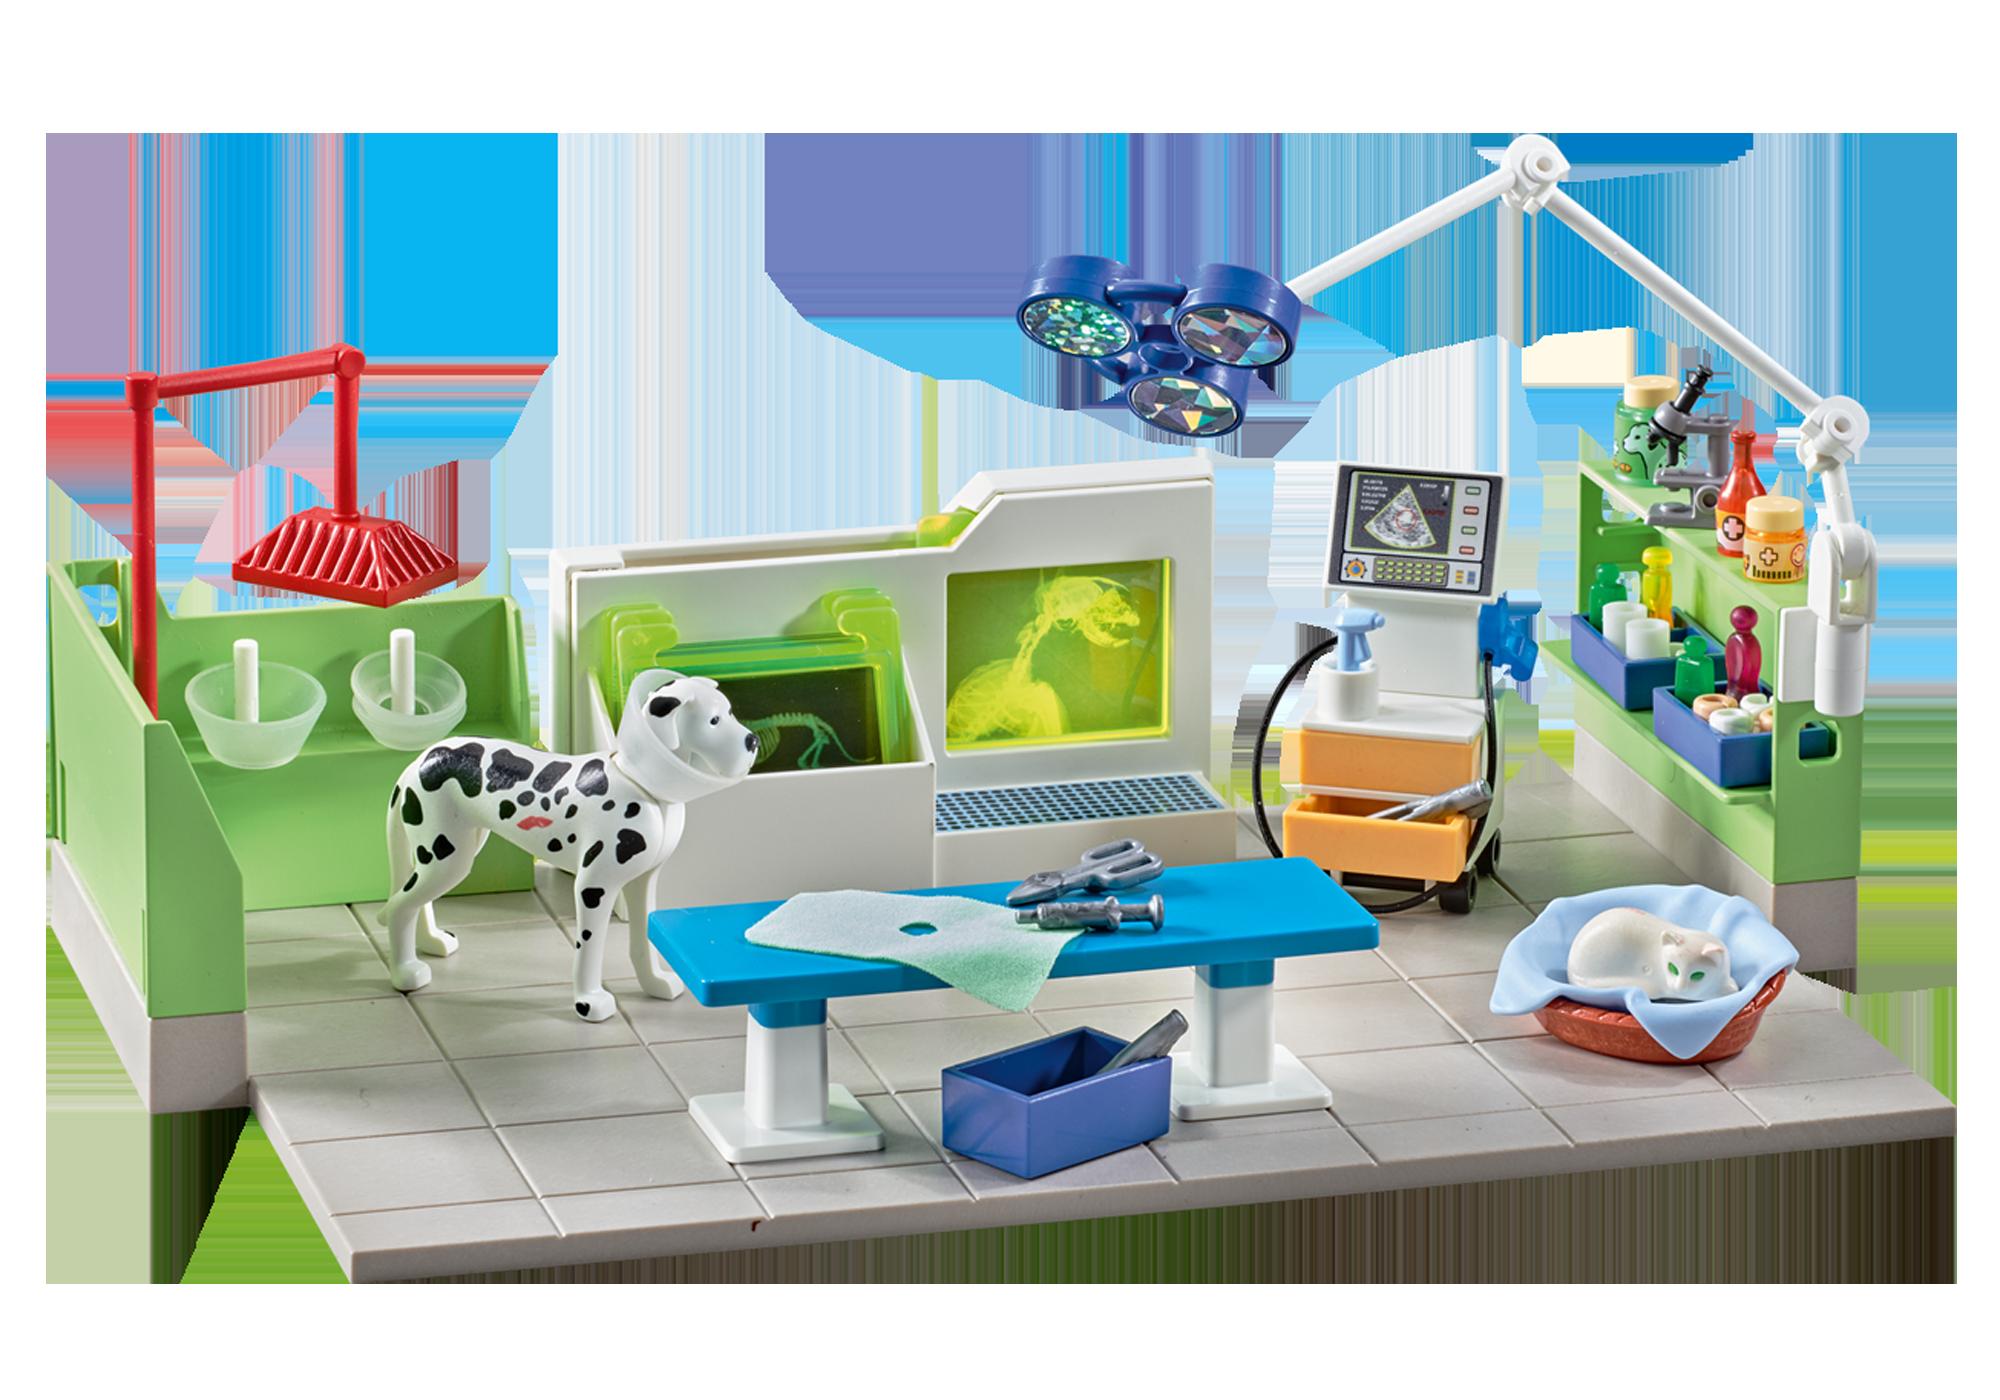 9816_product_detail/Κλινική μικρών ζώων με ακτινογραφικό μηχάνημα